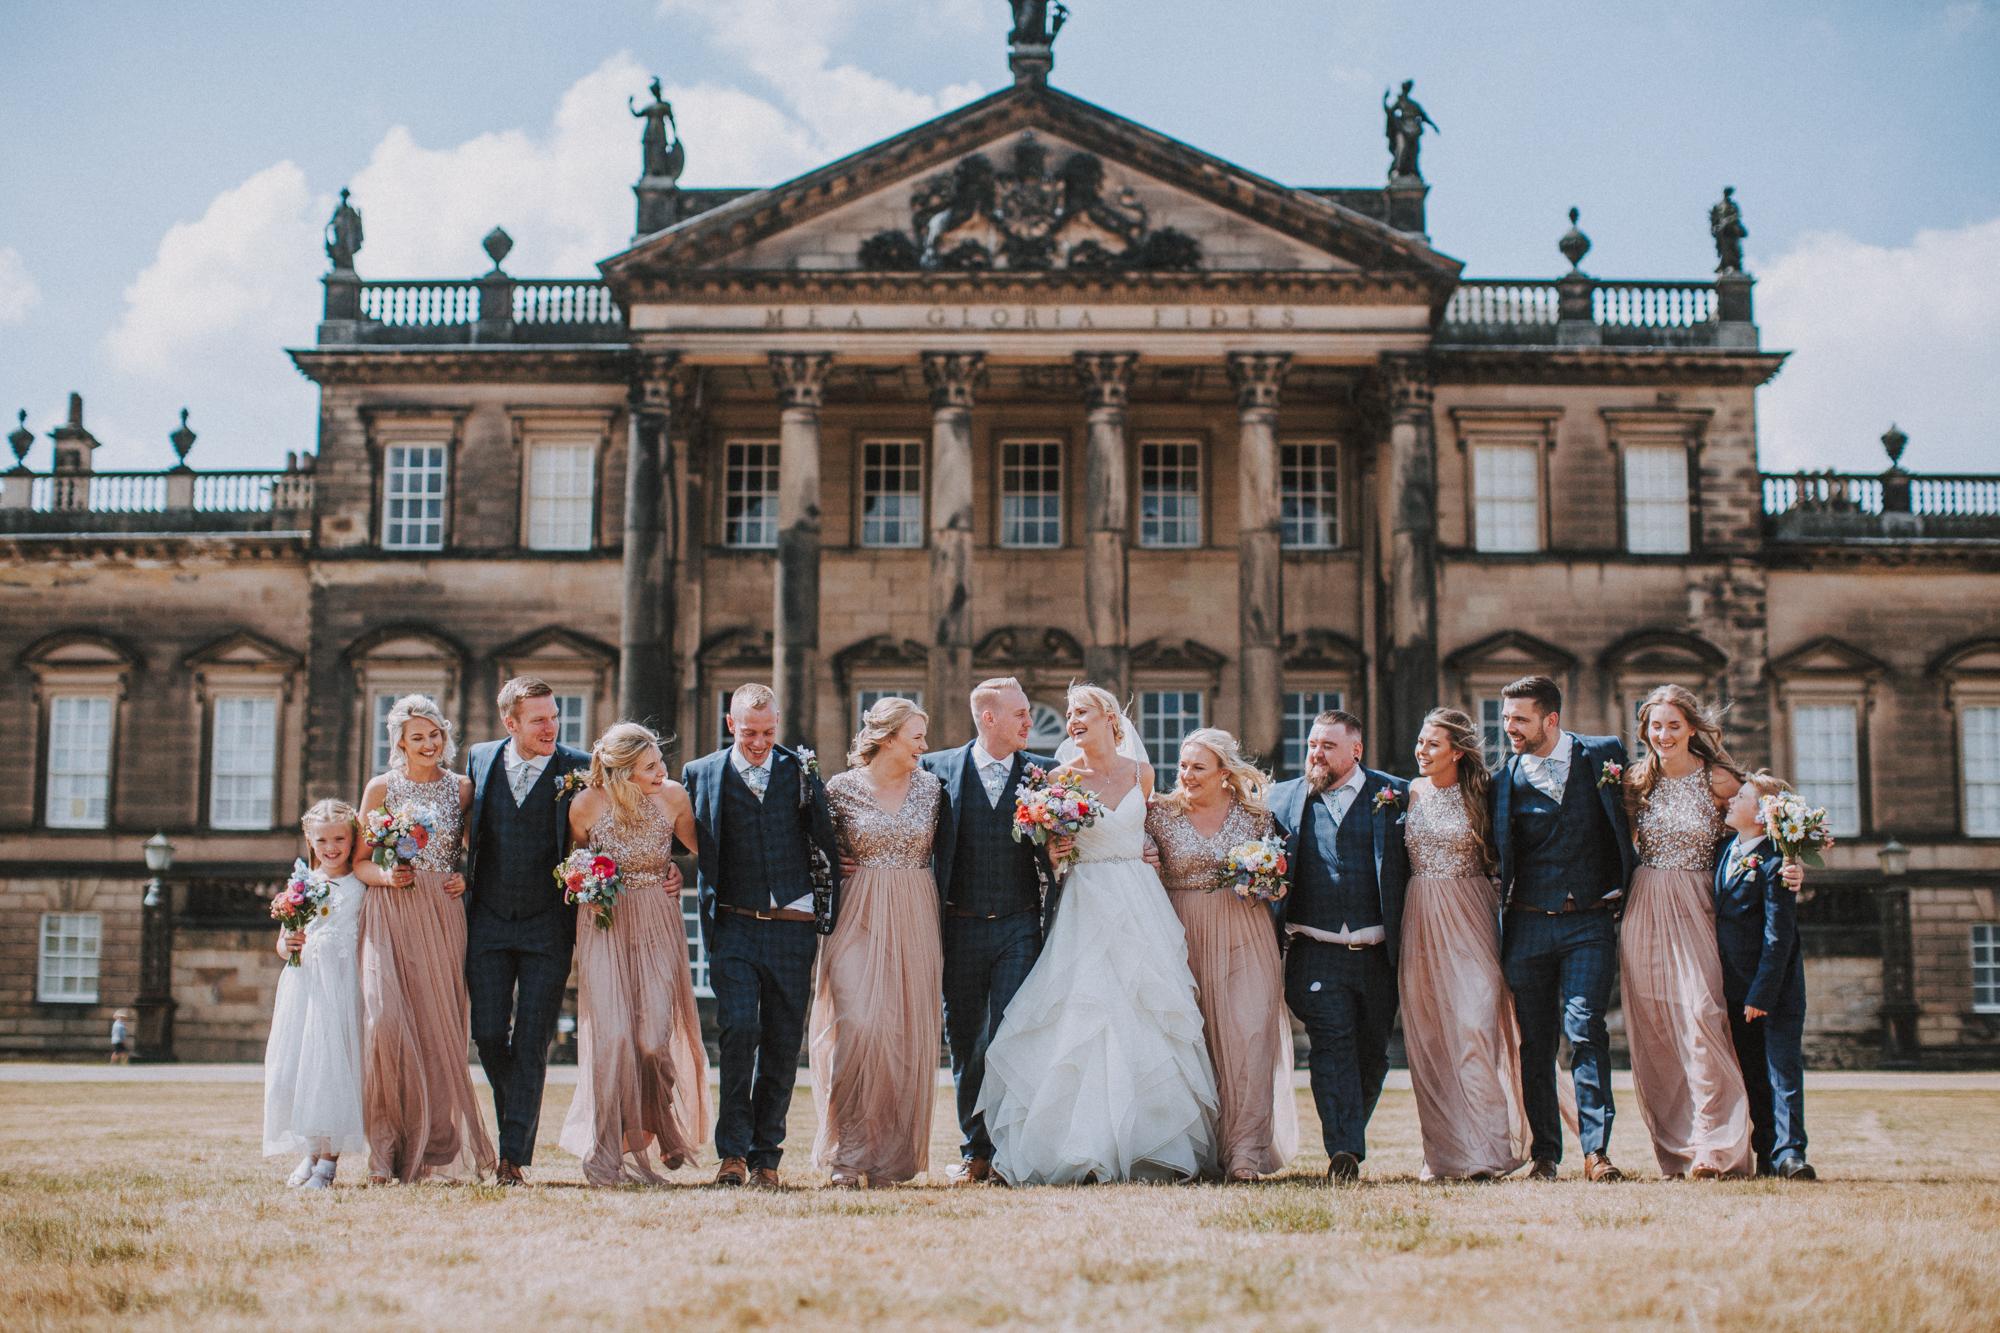 wentworth woodhouse weddings photographer-37.jpg